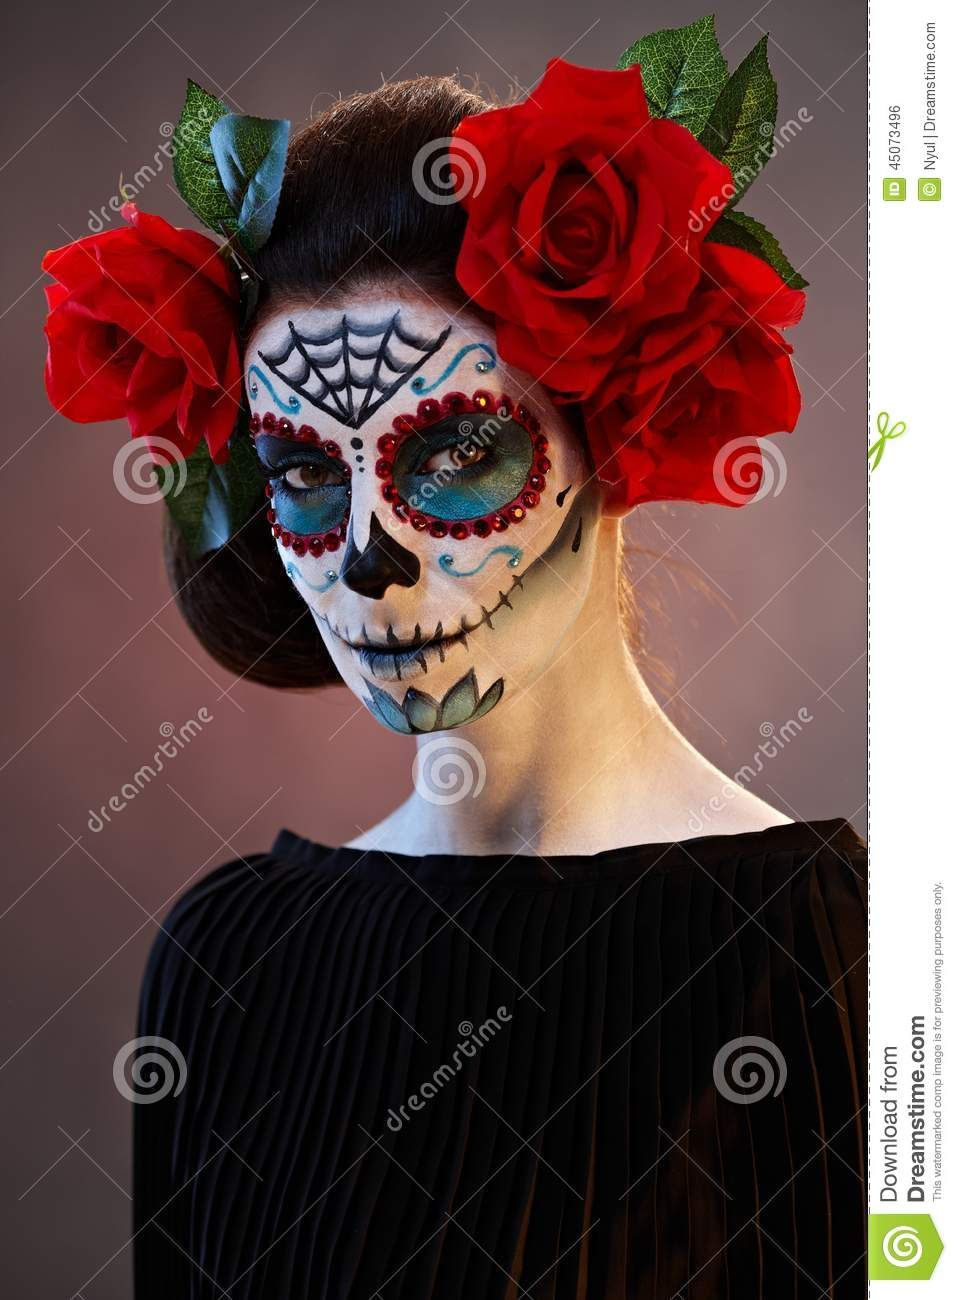 la muerte mexicana maquillaje google search day of the. Black Bedroom Furniture Sets. Home Design Ideas